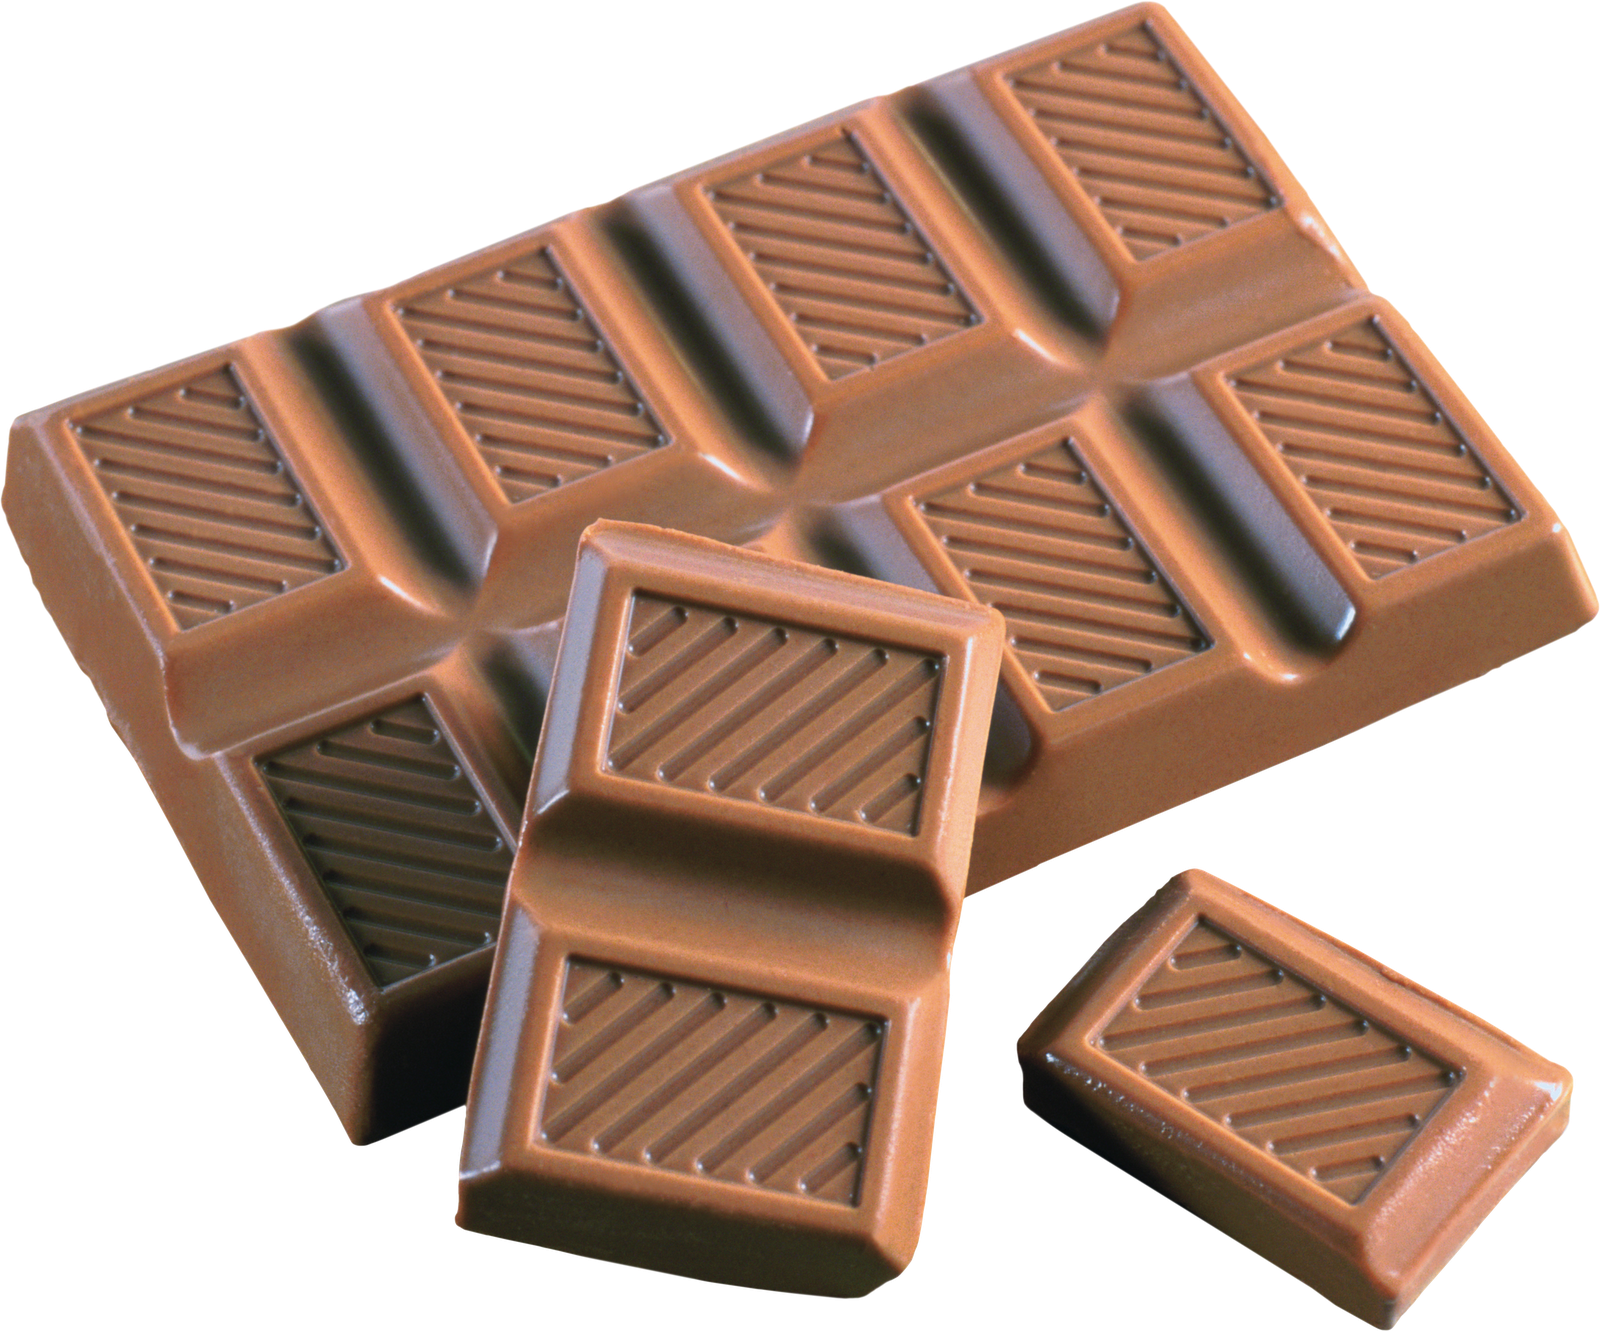 Chocolate bar PNG image - Ambrozijntje PNG